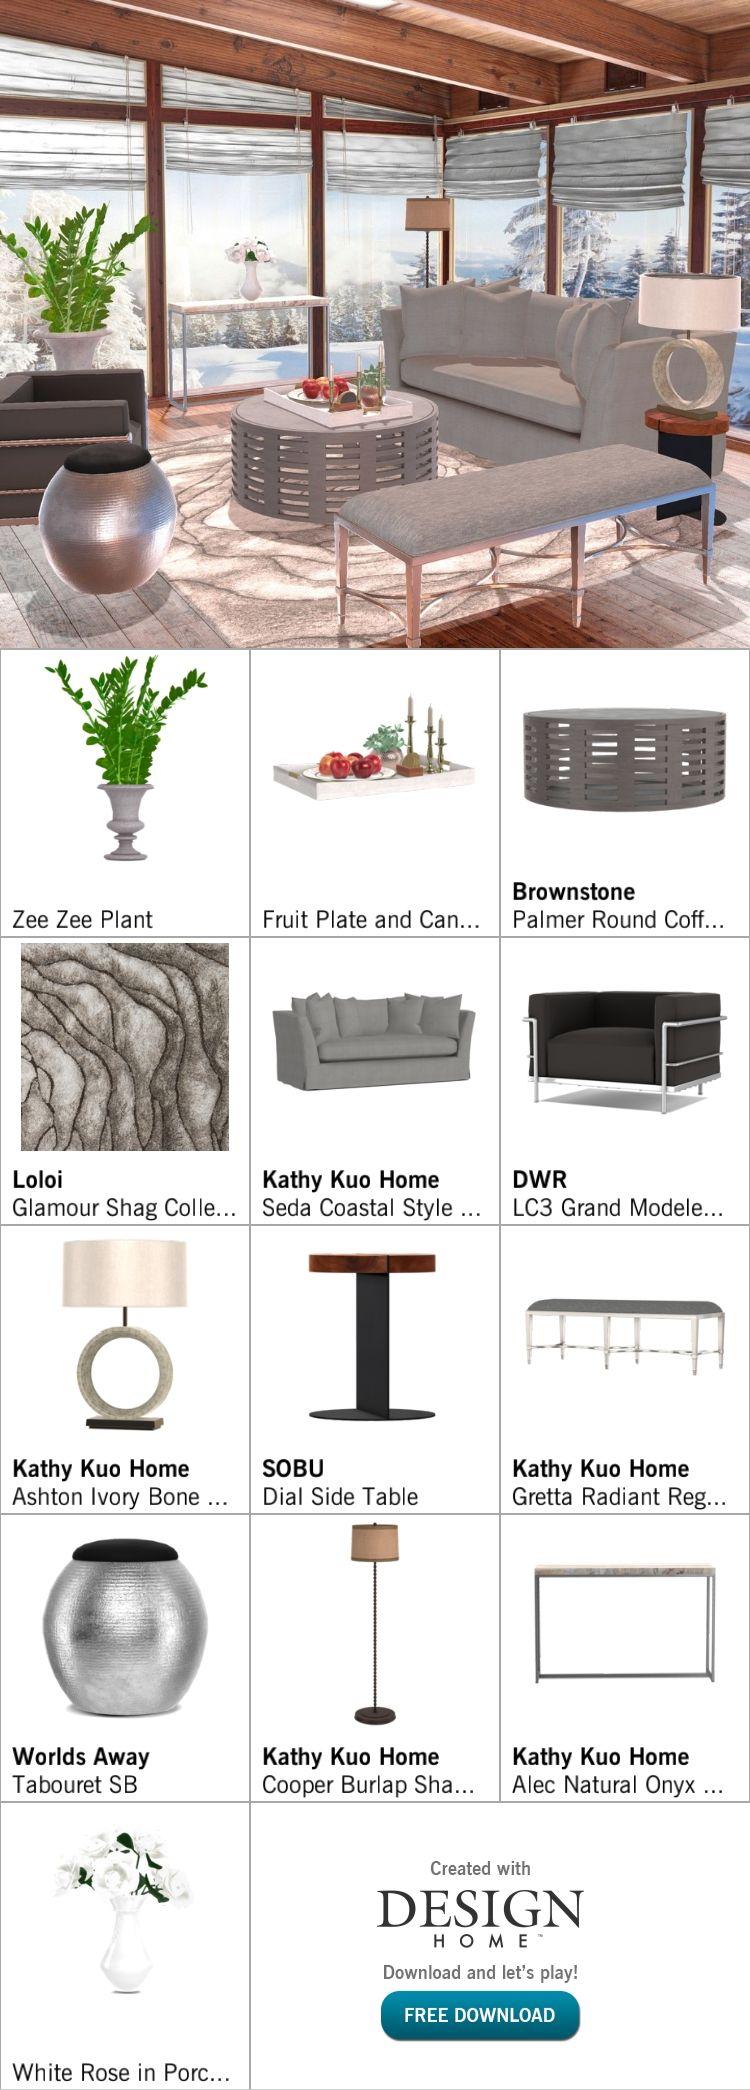 Home interior fruit plates created with design home  design u decor  pinterest